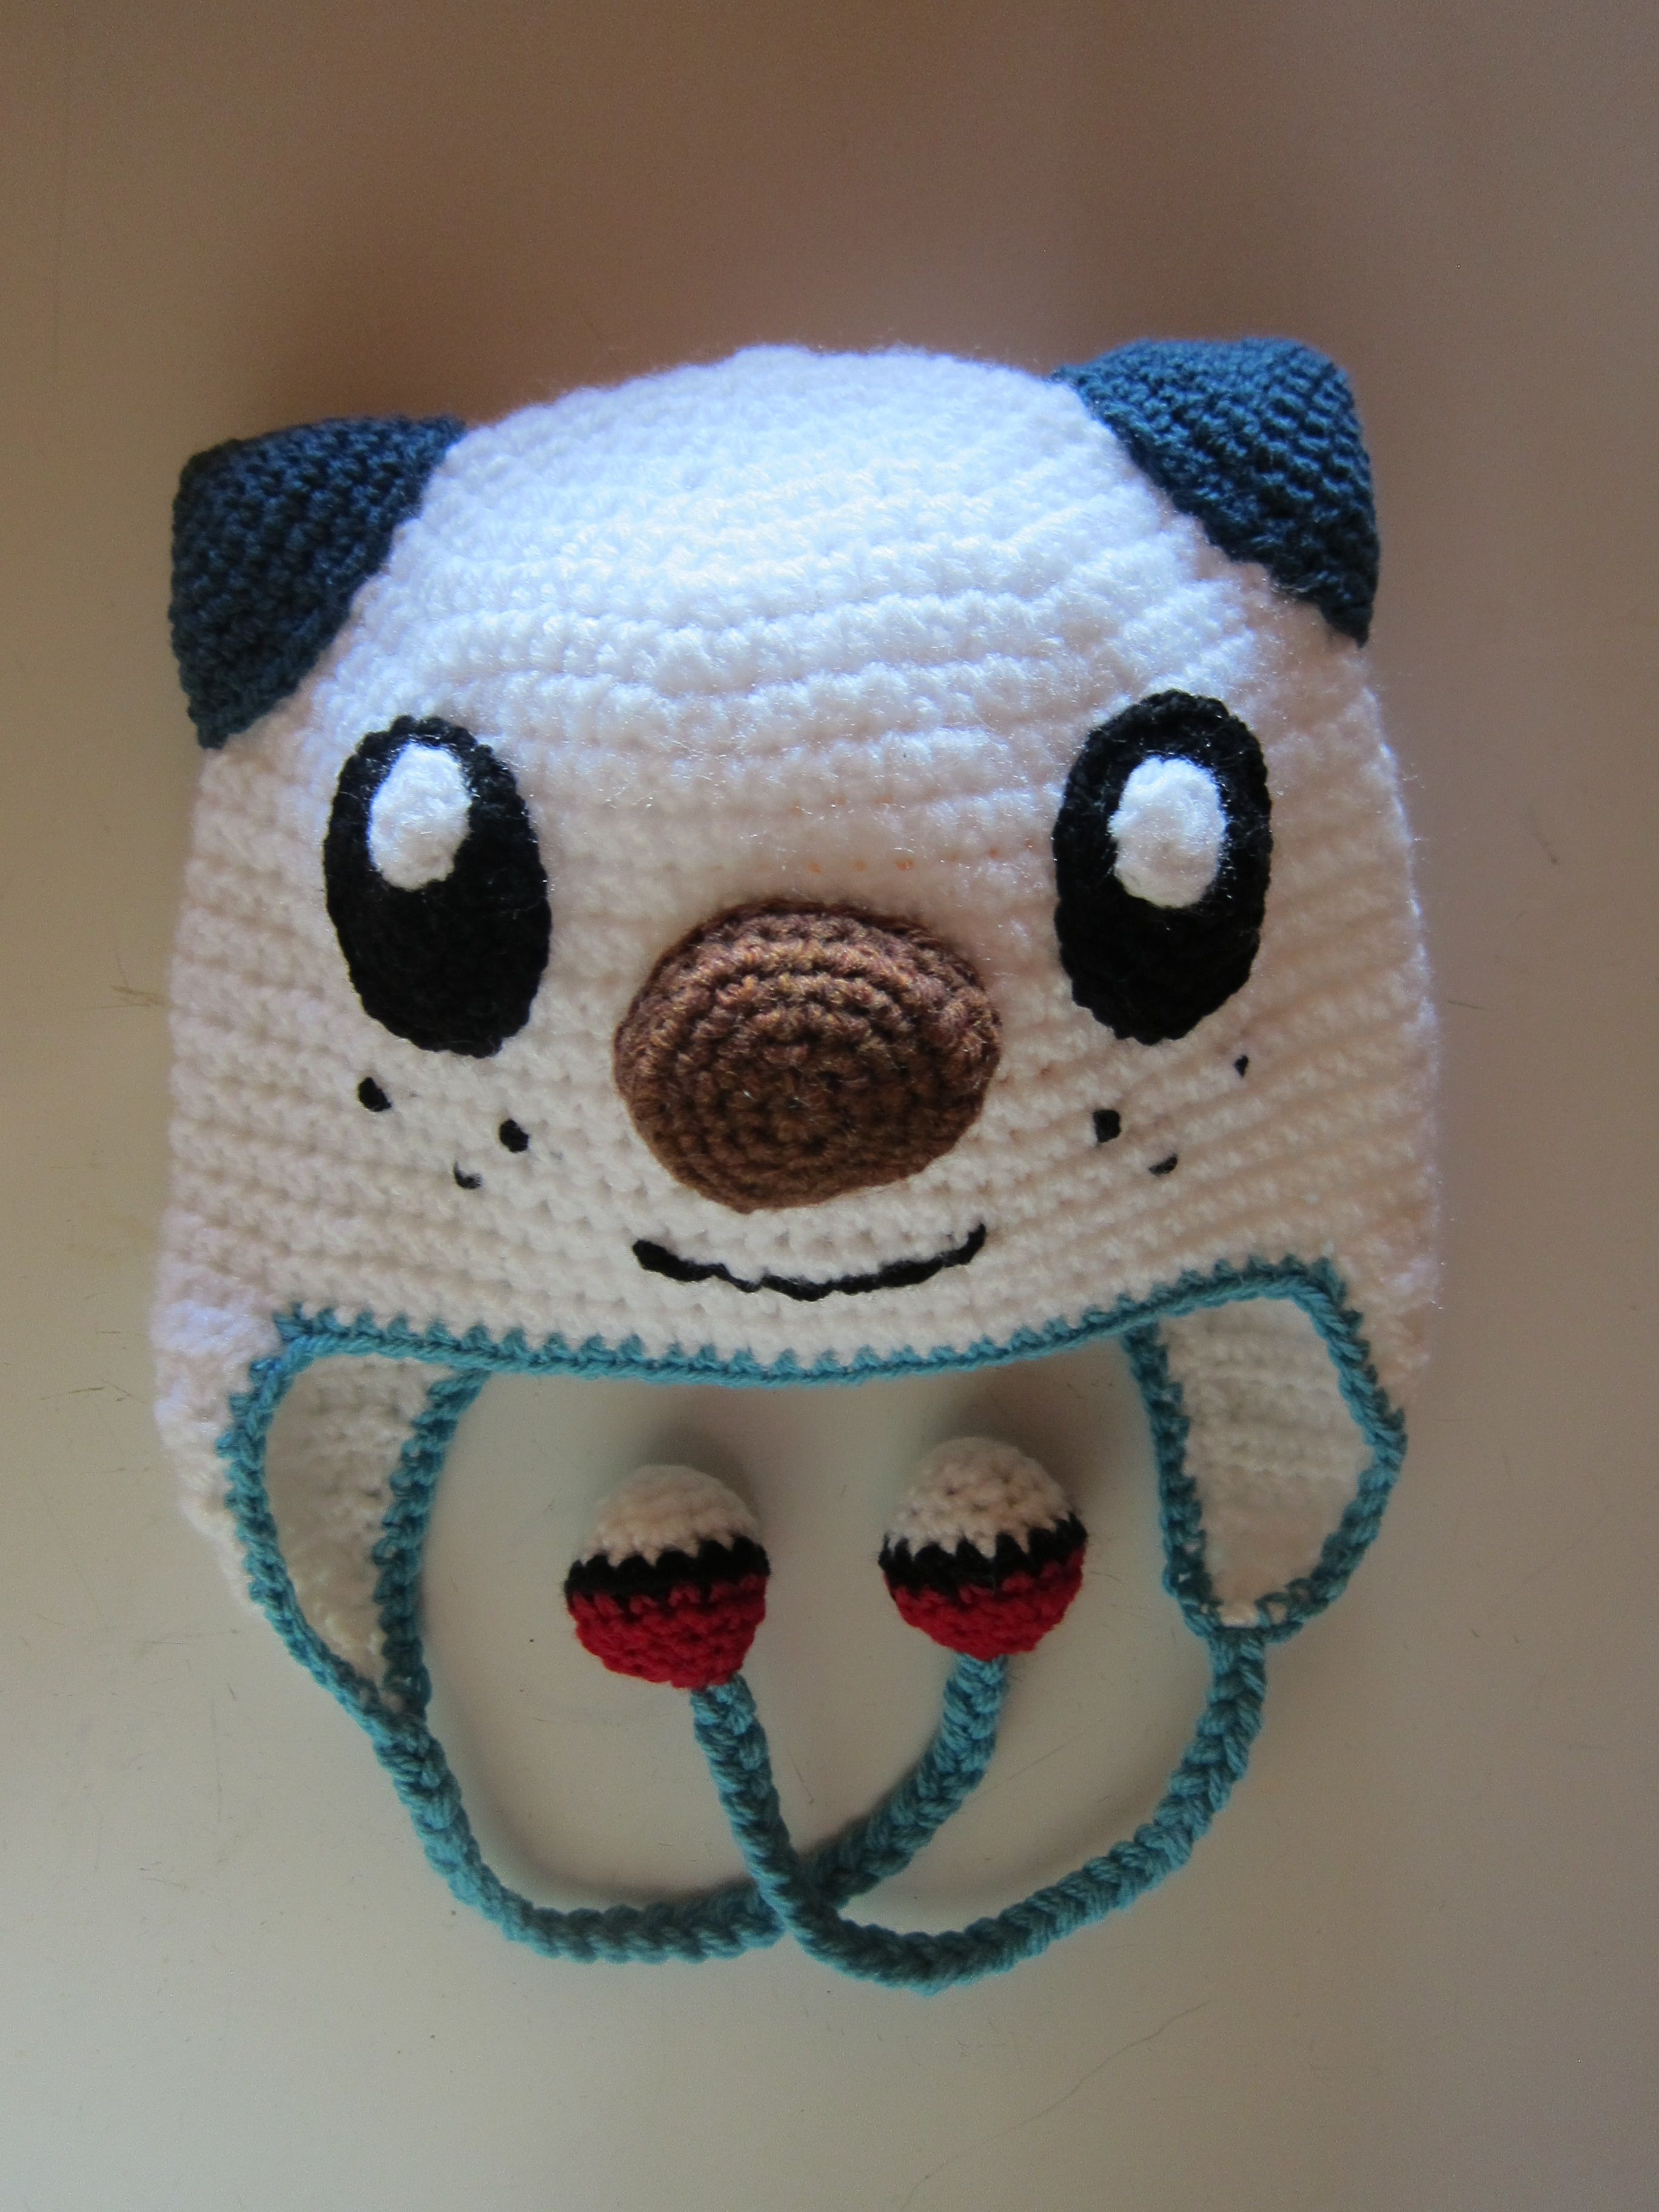 Crocheted Oshawott Hat Pokémon Character No Pattern Crochet